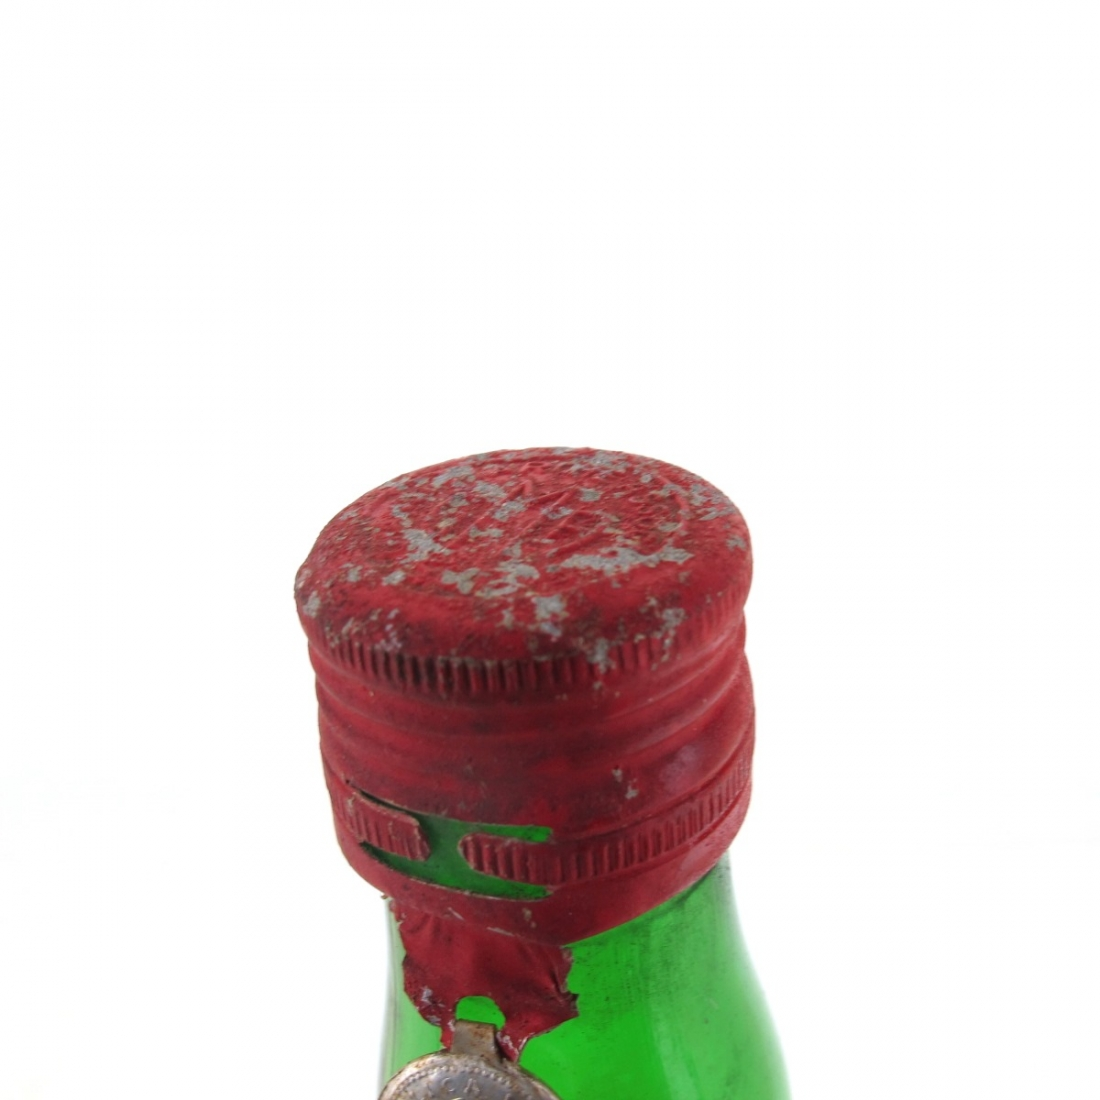 Sarti Apricot Liqueur 1950s